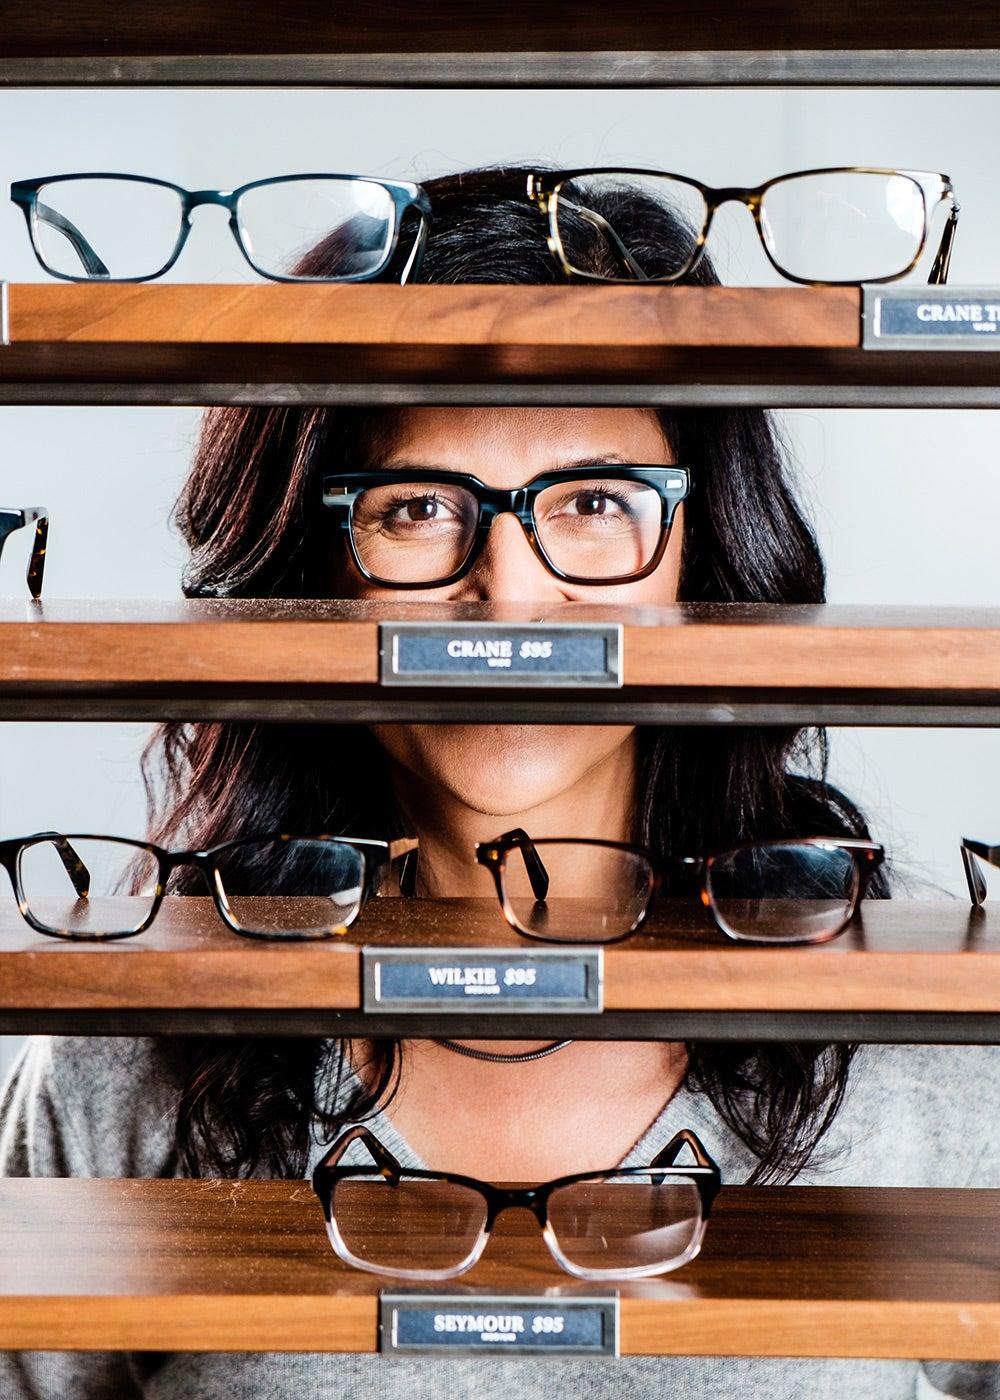 Warby Parker on the glasses shelf